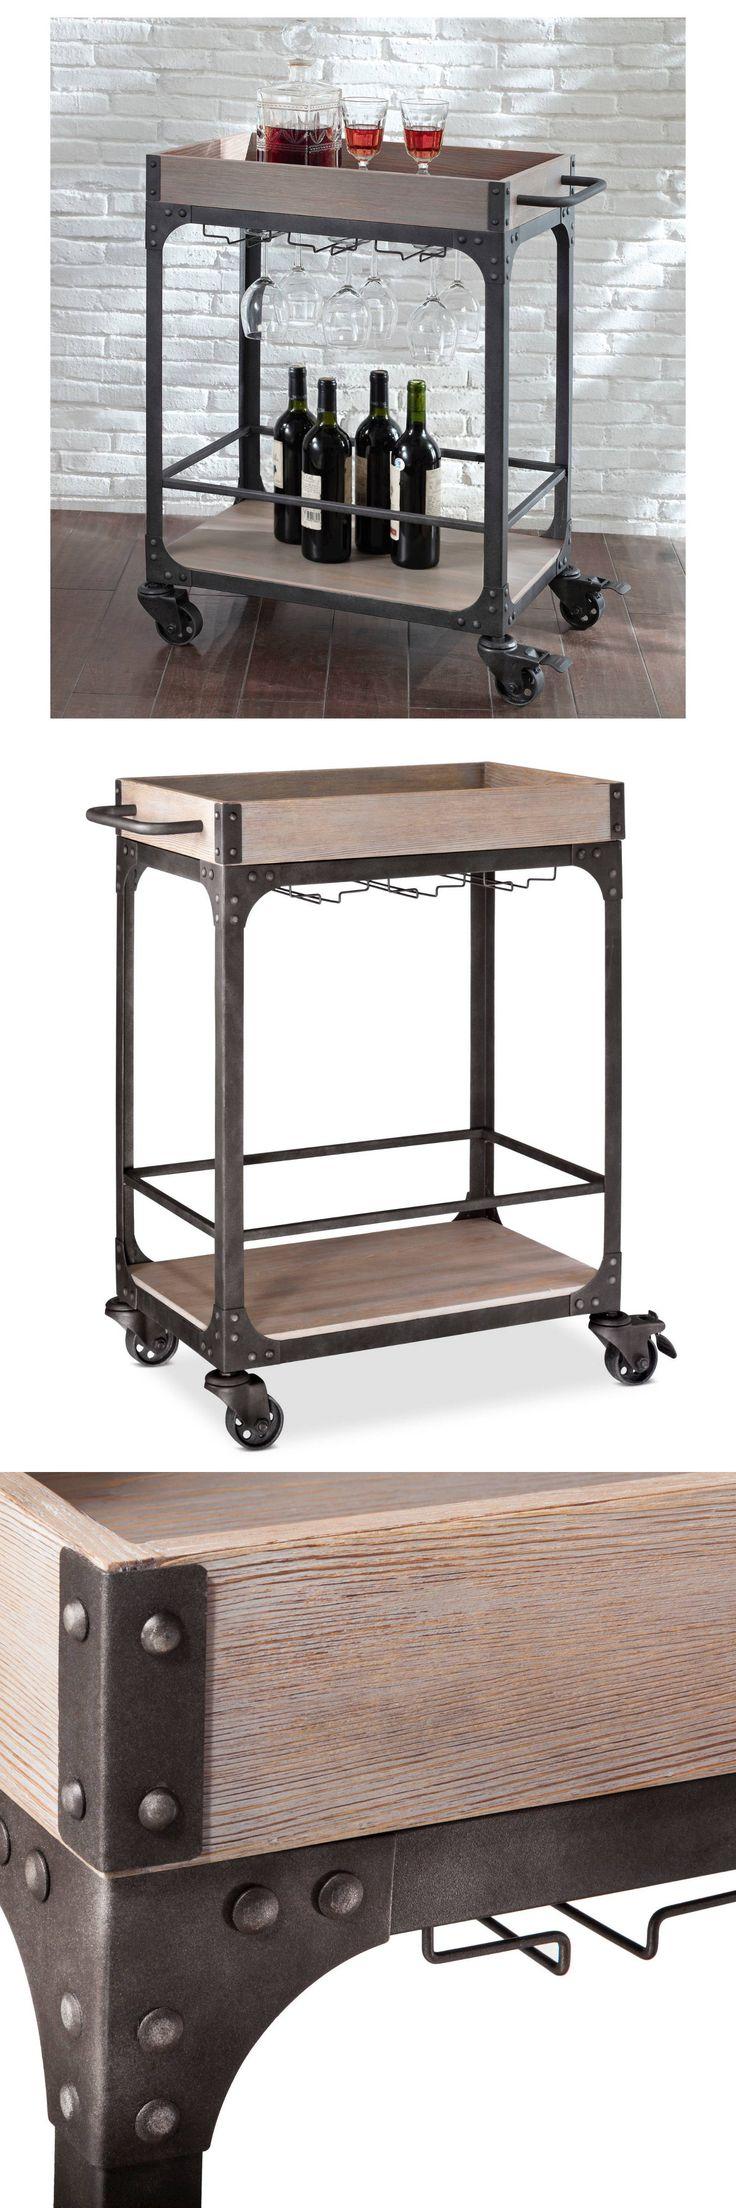 best 25 serving trolley ideas on pinterest drinks trolley bar trolley and bar carts. Black Bedroom Furniture Sets. Home Design Ideas